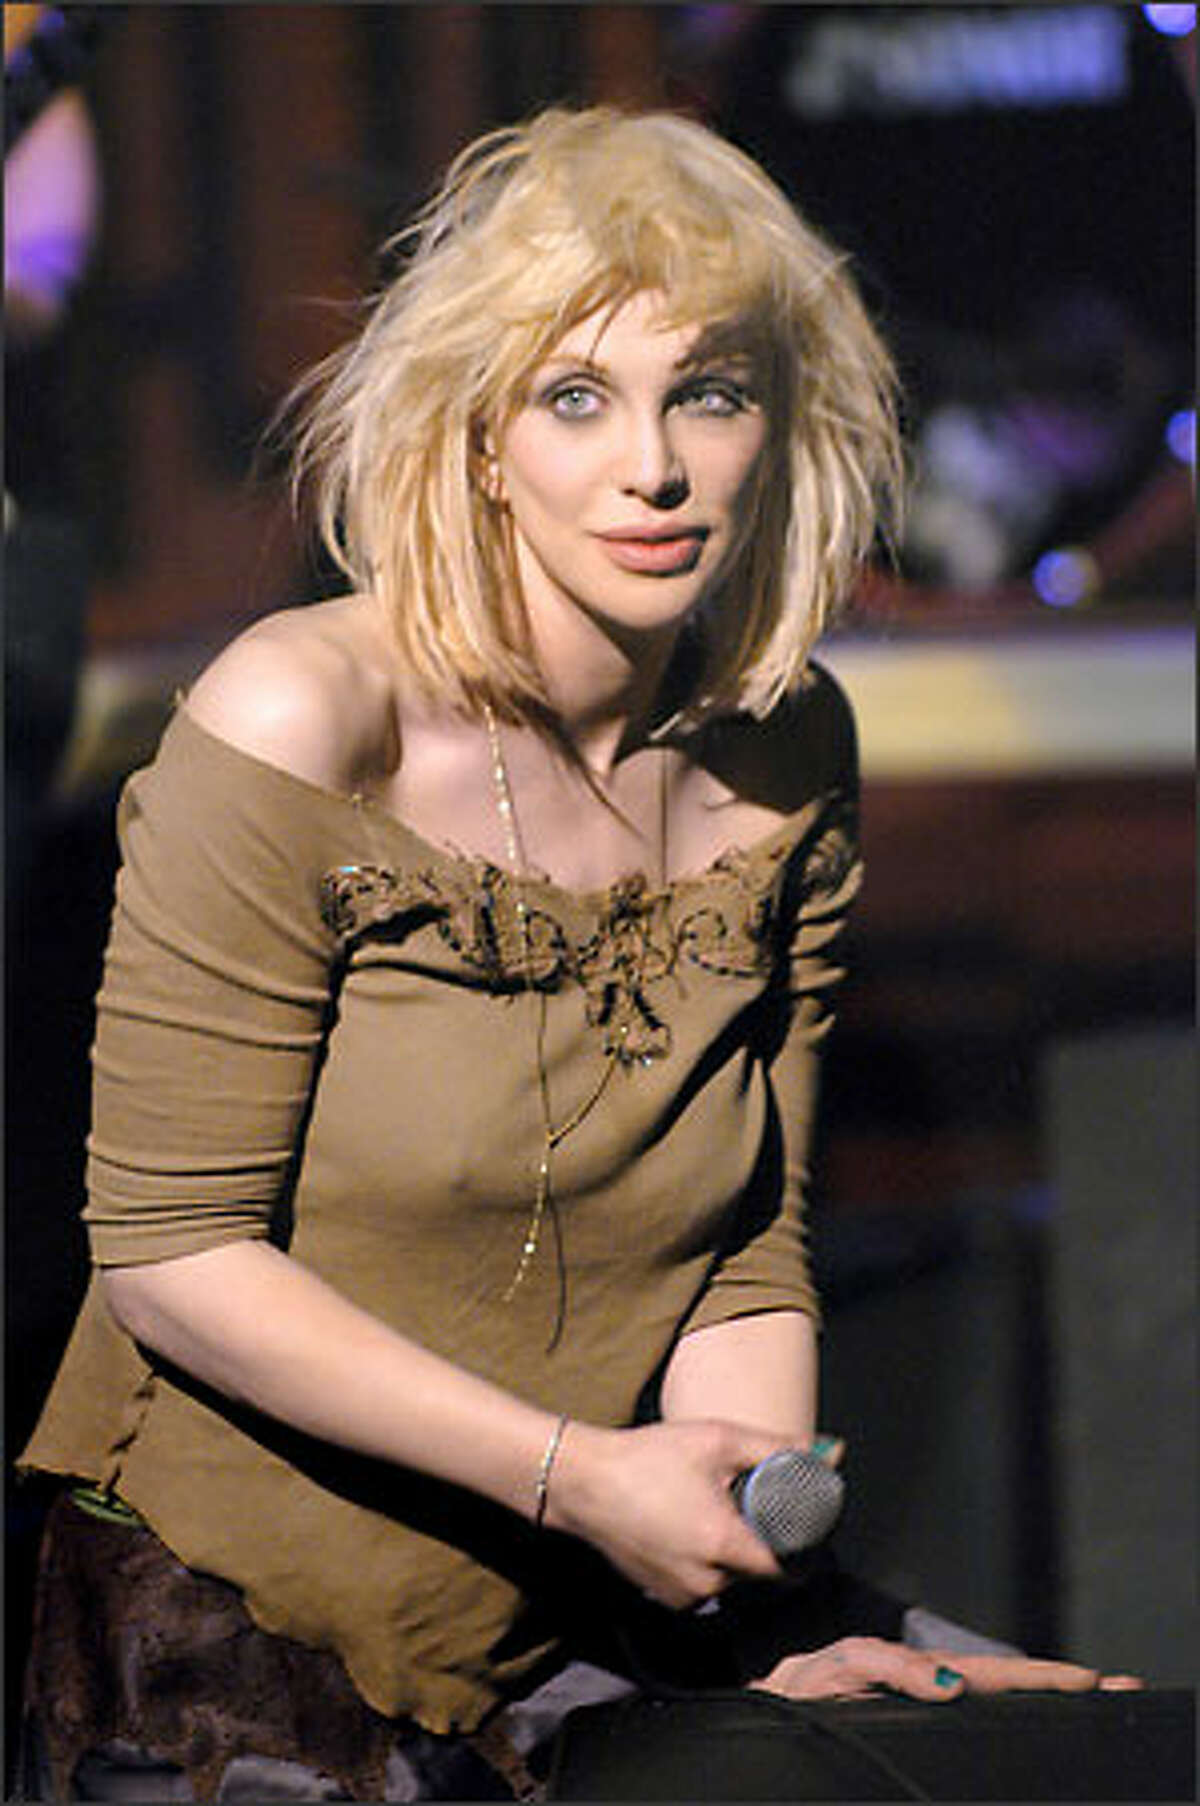 Courtney Love on